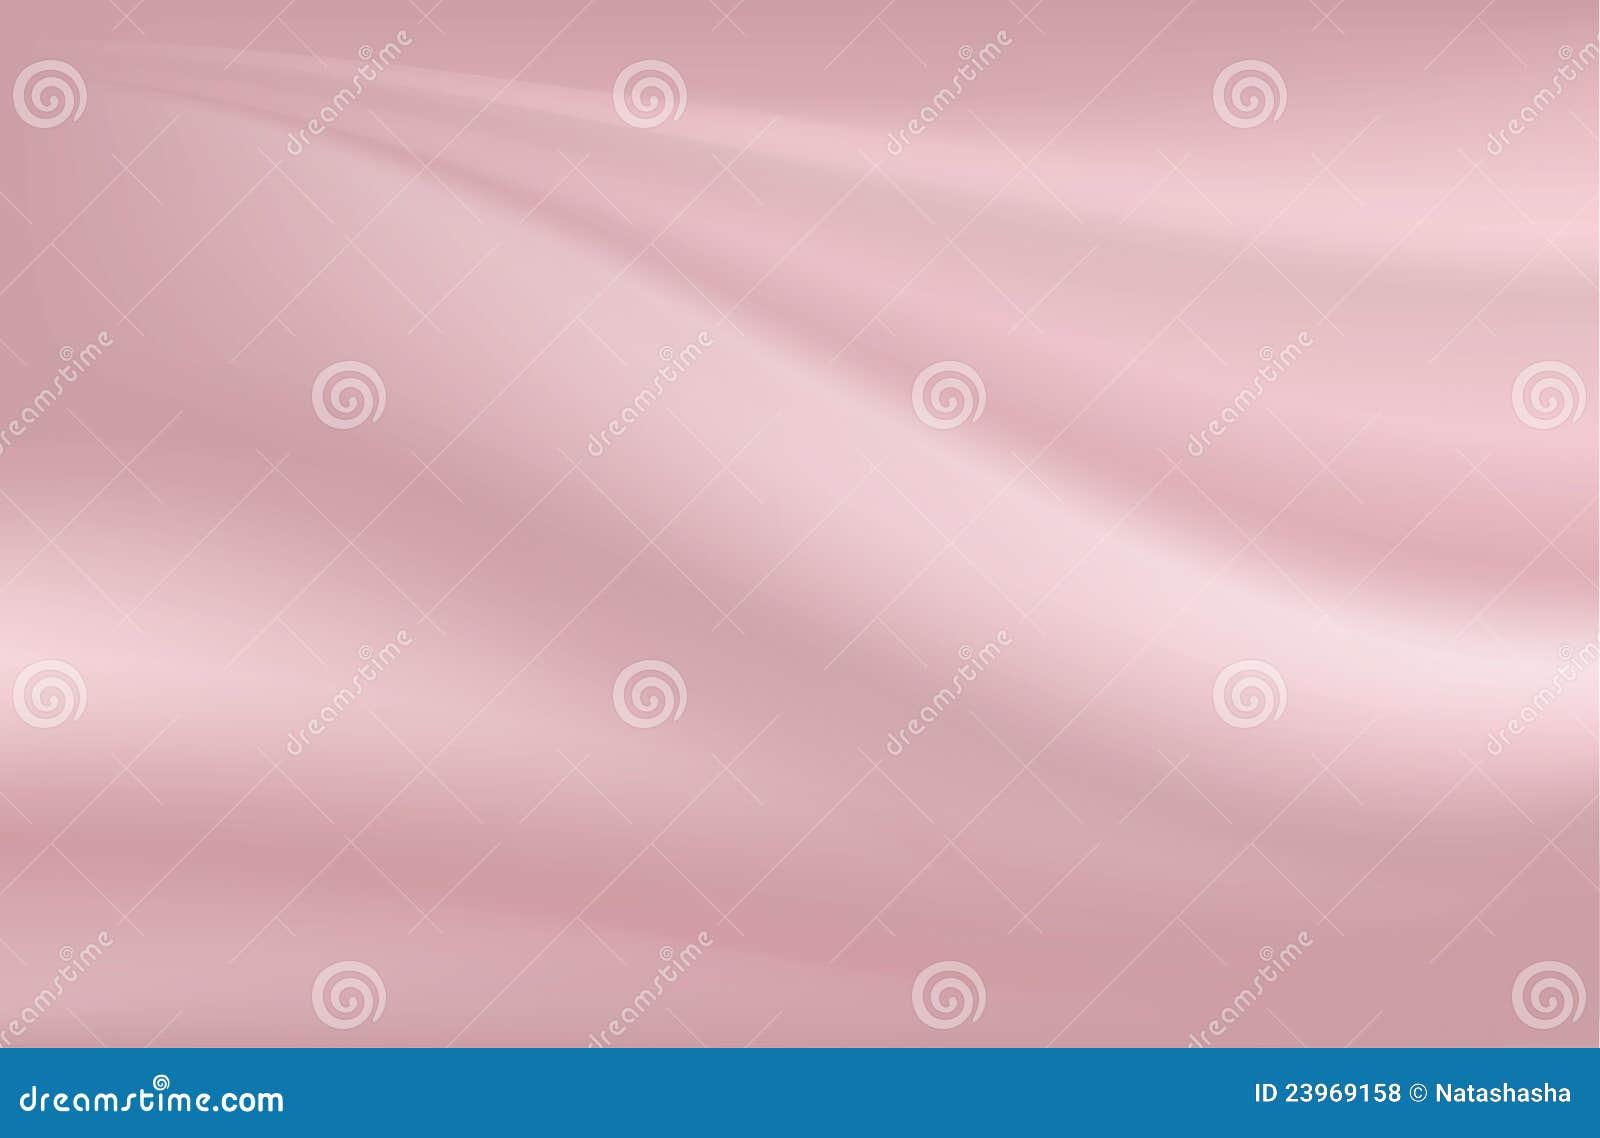 Royalty Free Stock Photos  Pink satin backgroundPink Satin Background